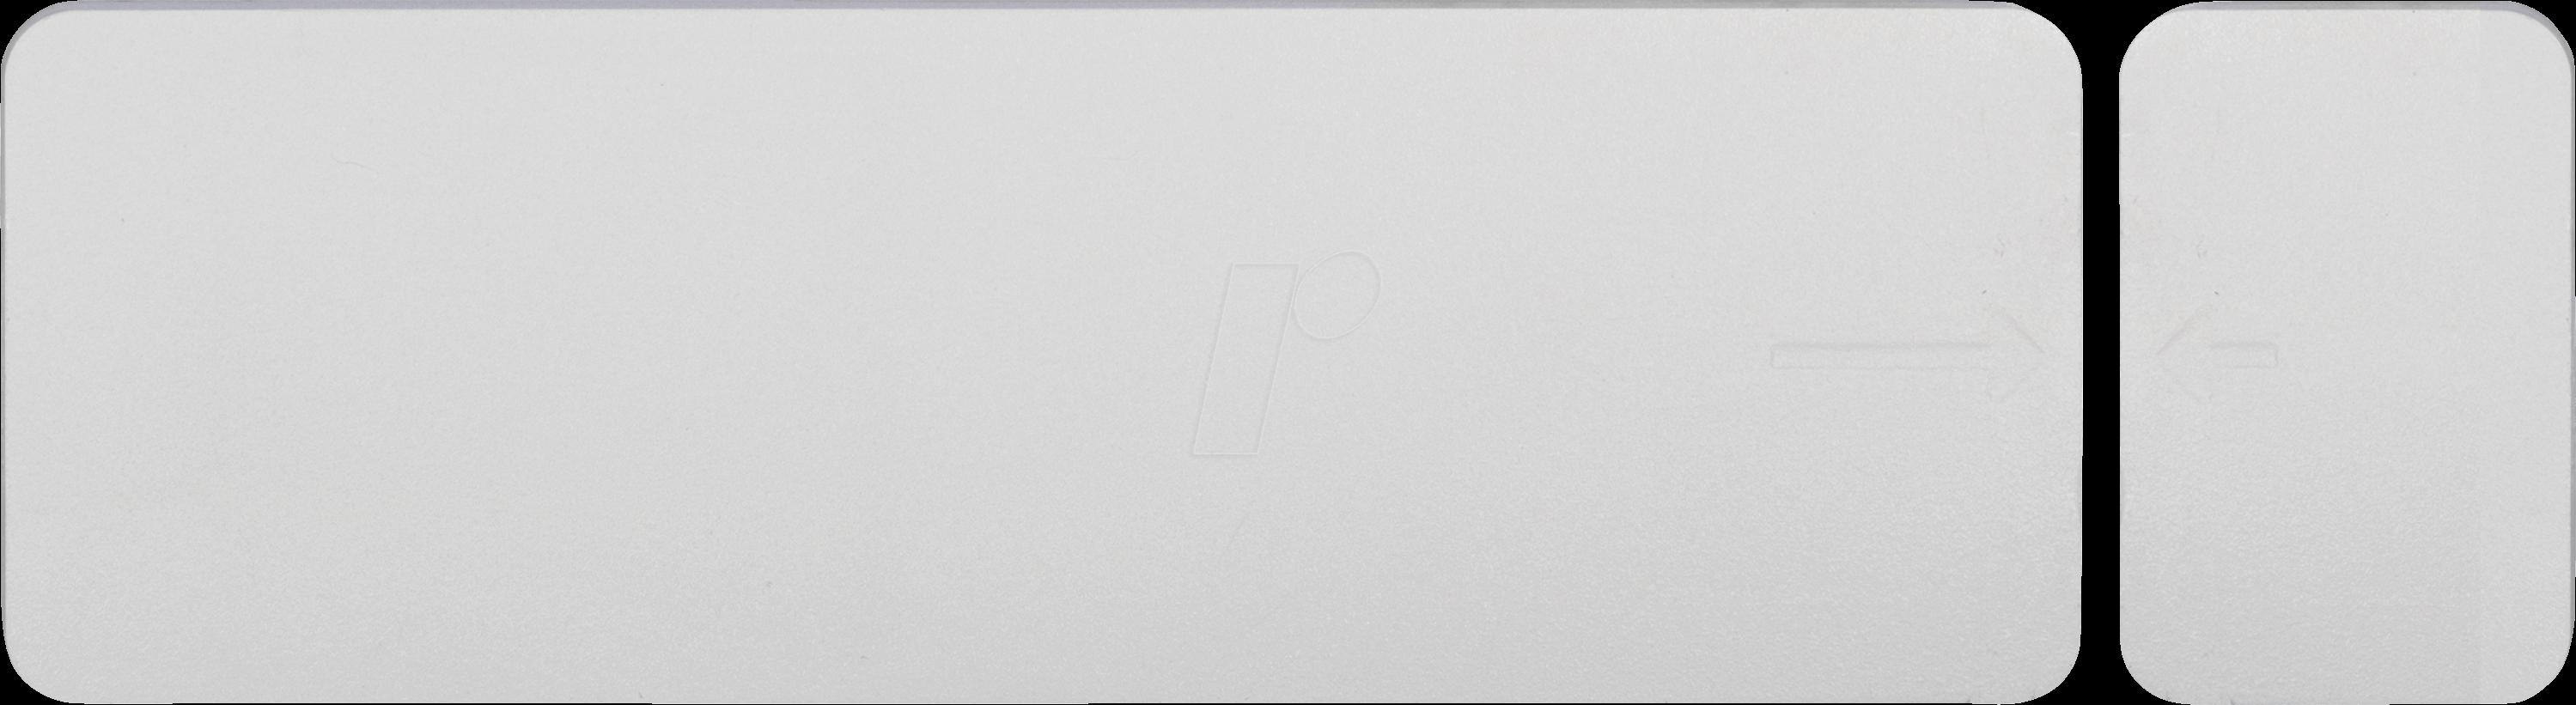 RADE 32003164 - Funk-Tür-/Fensterkontakt DuoFern